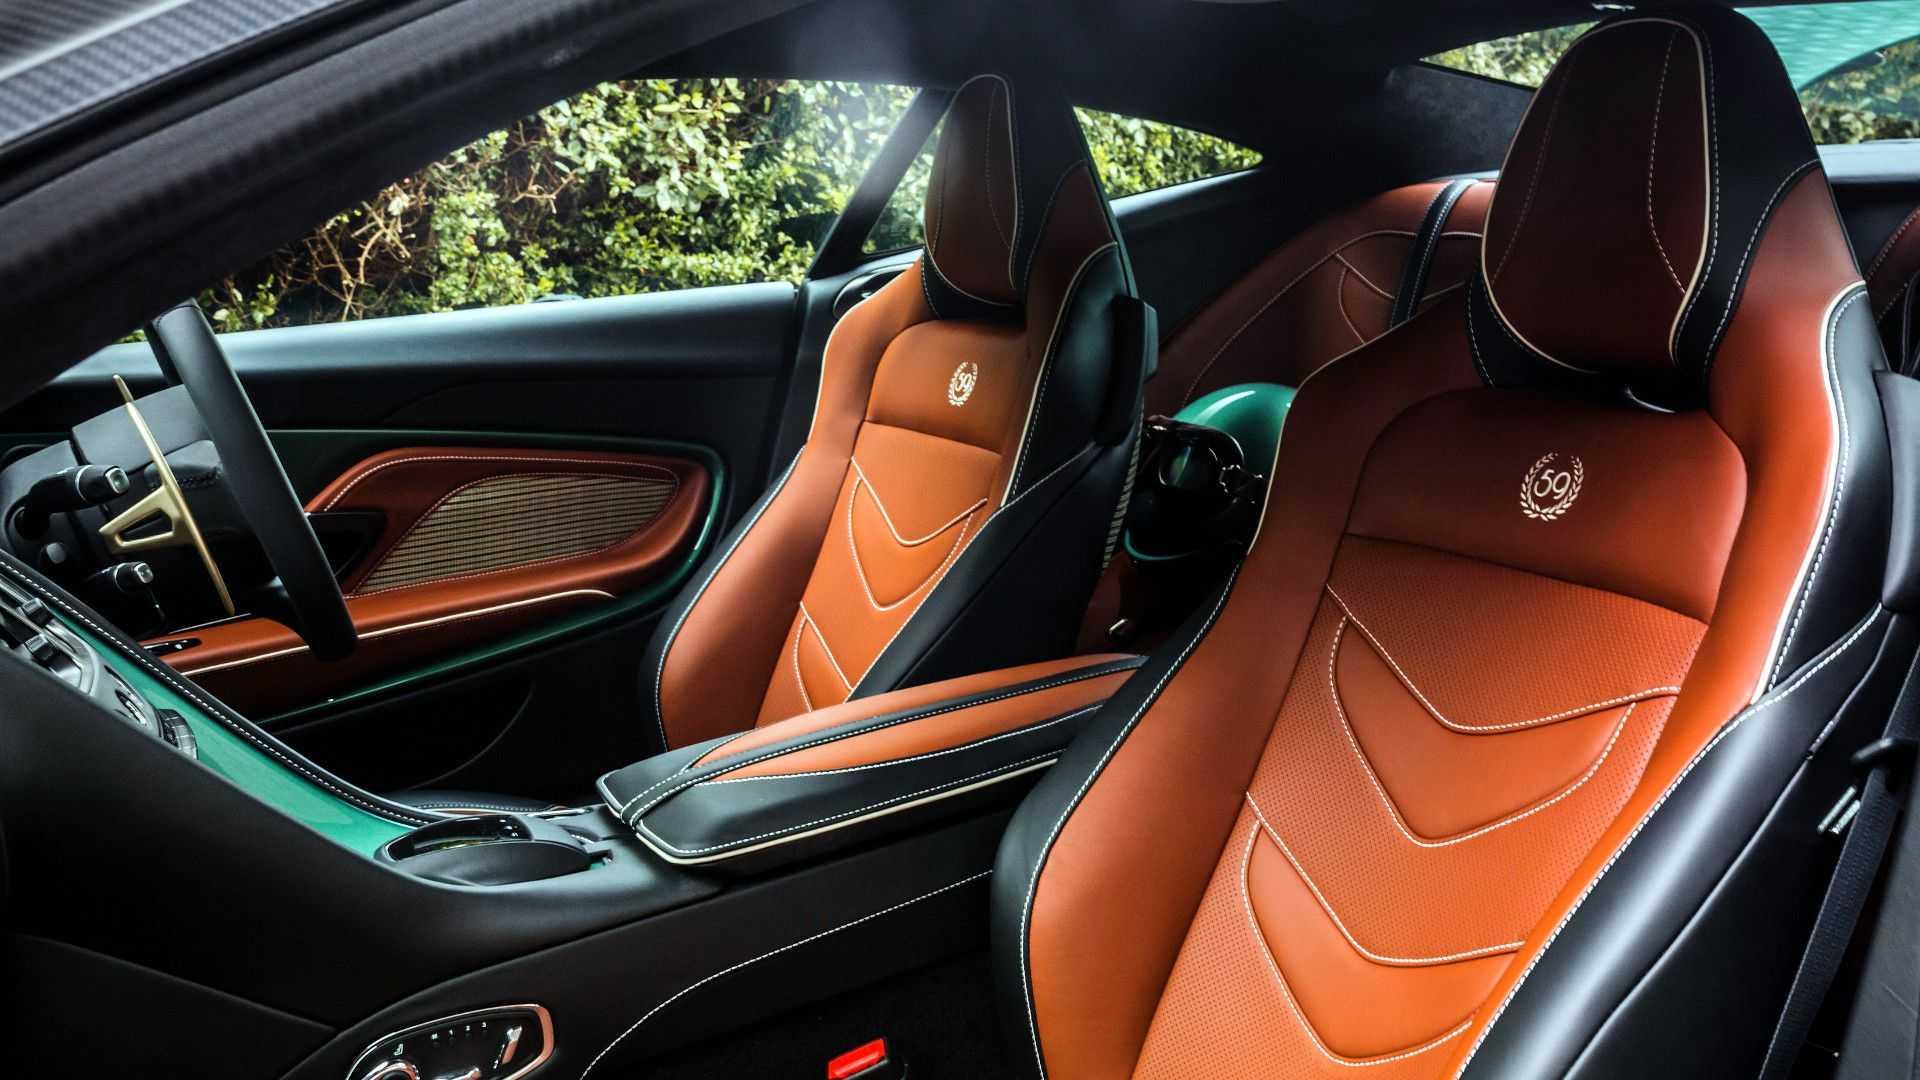 2019 Aston Martin DBS 59 Interior Cockpit Wallpapers (14)